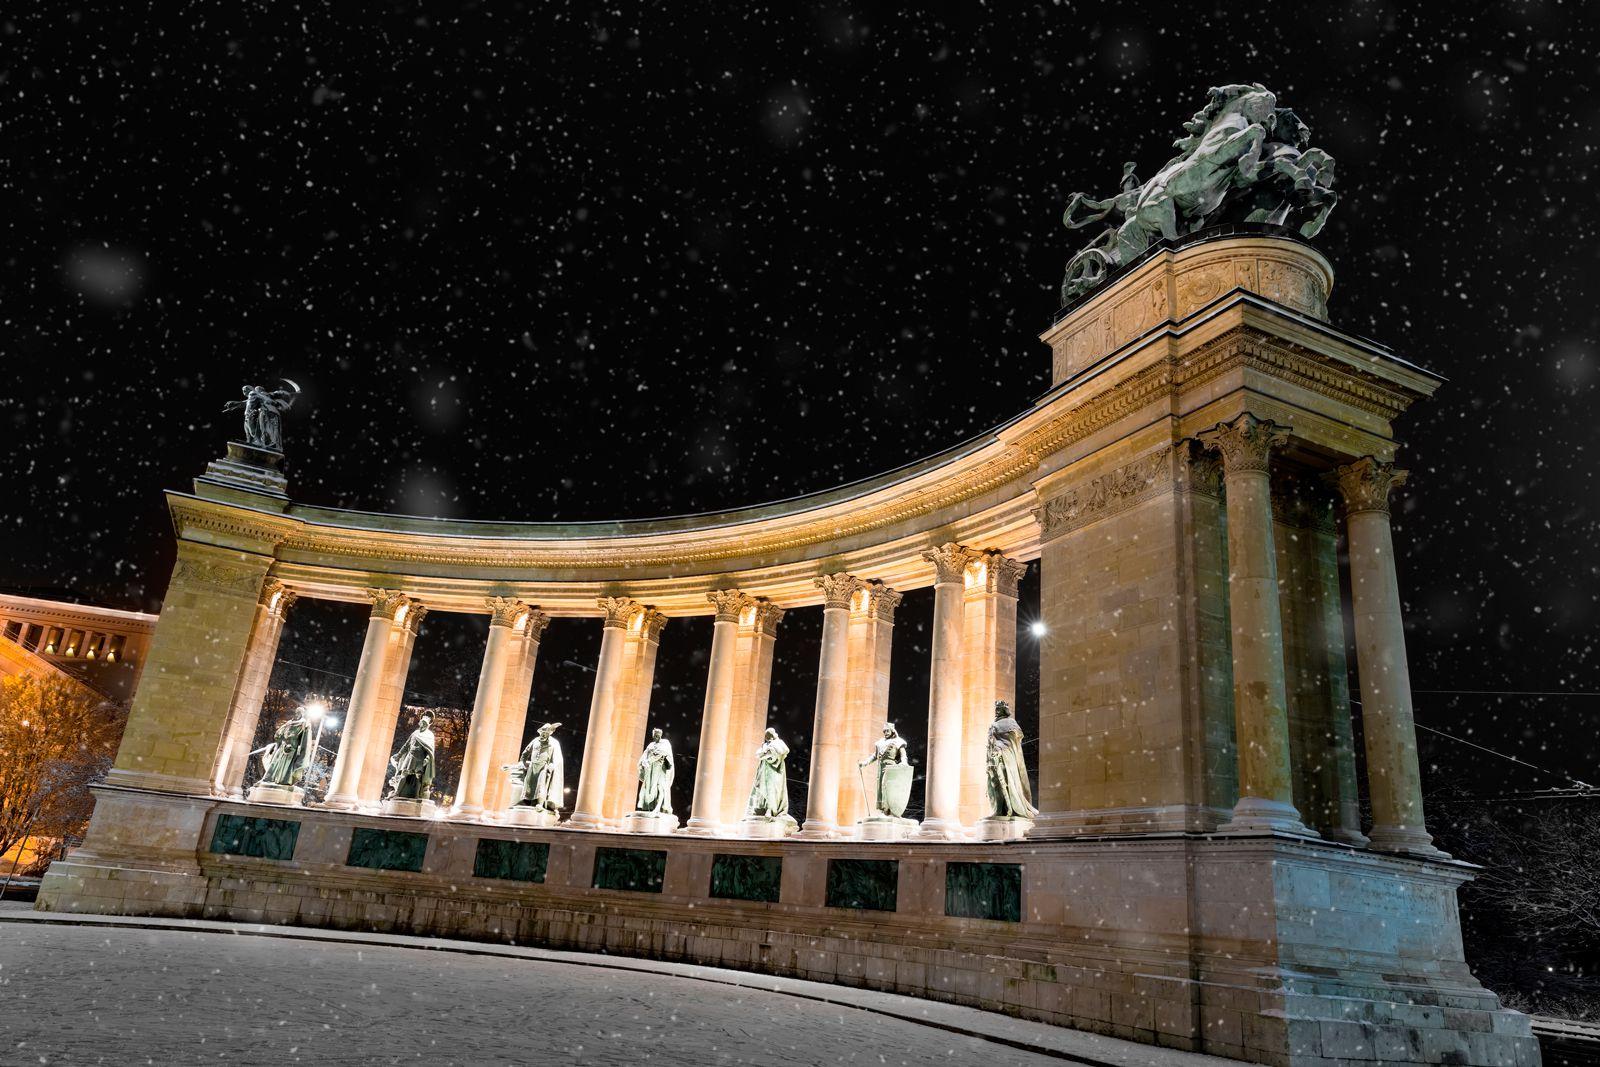 2021/01/Advent-Budimpešta-2.jpg